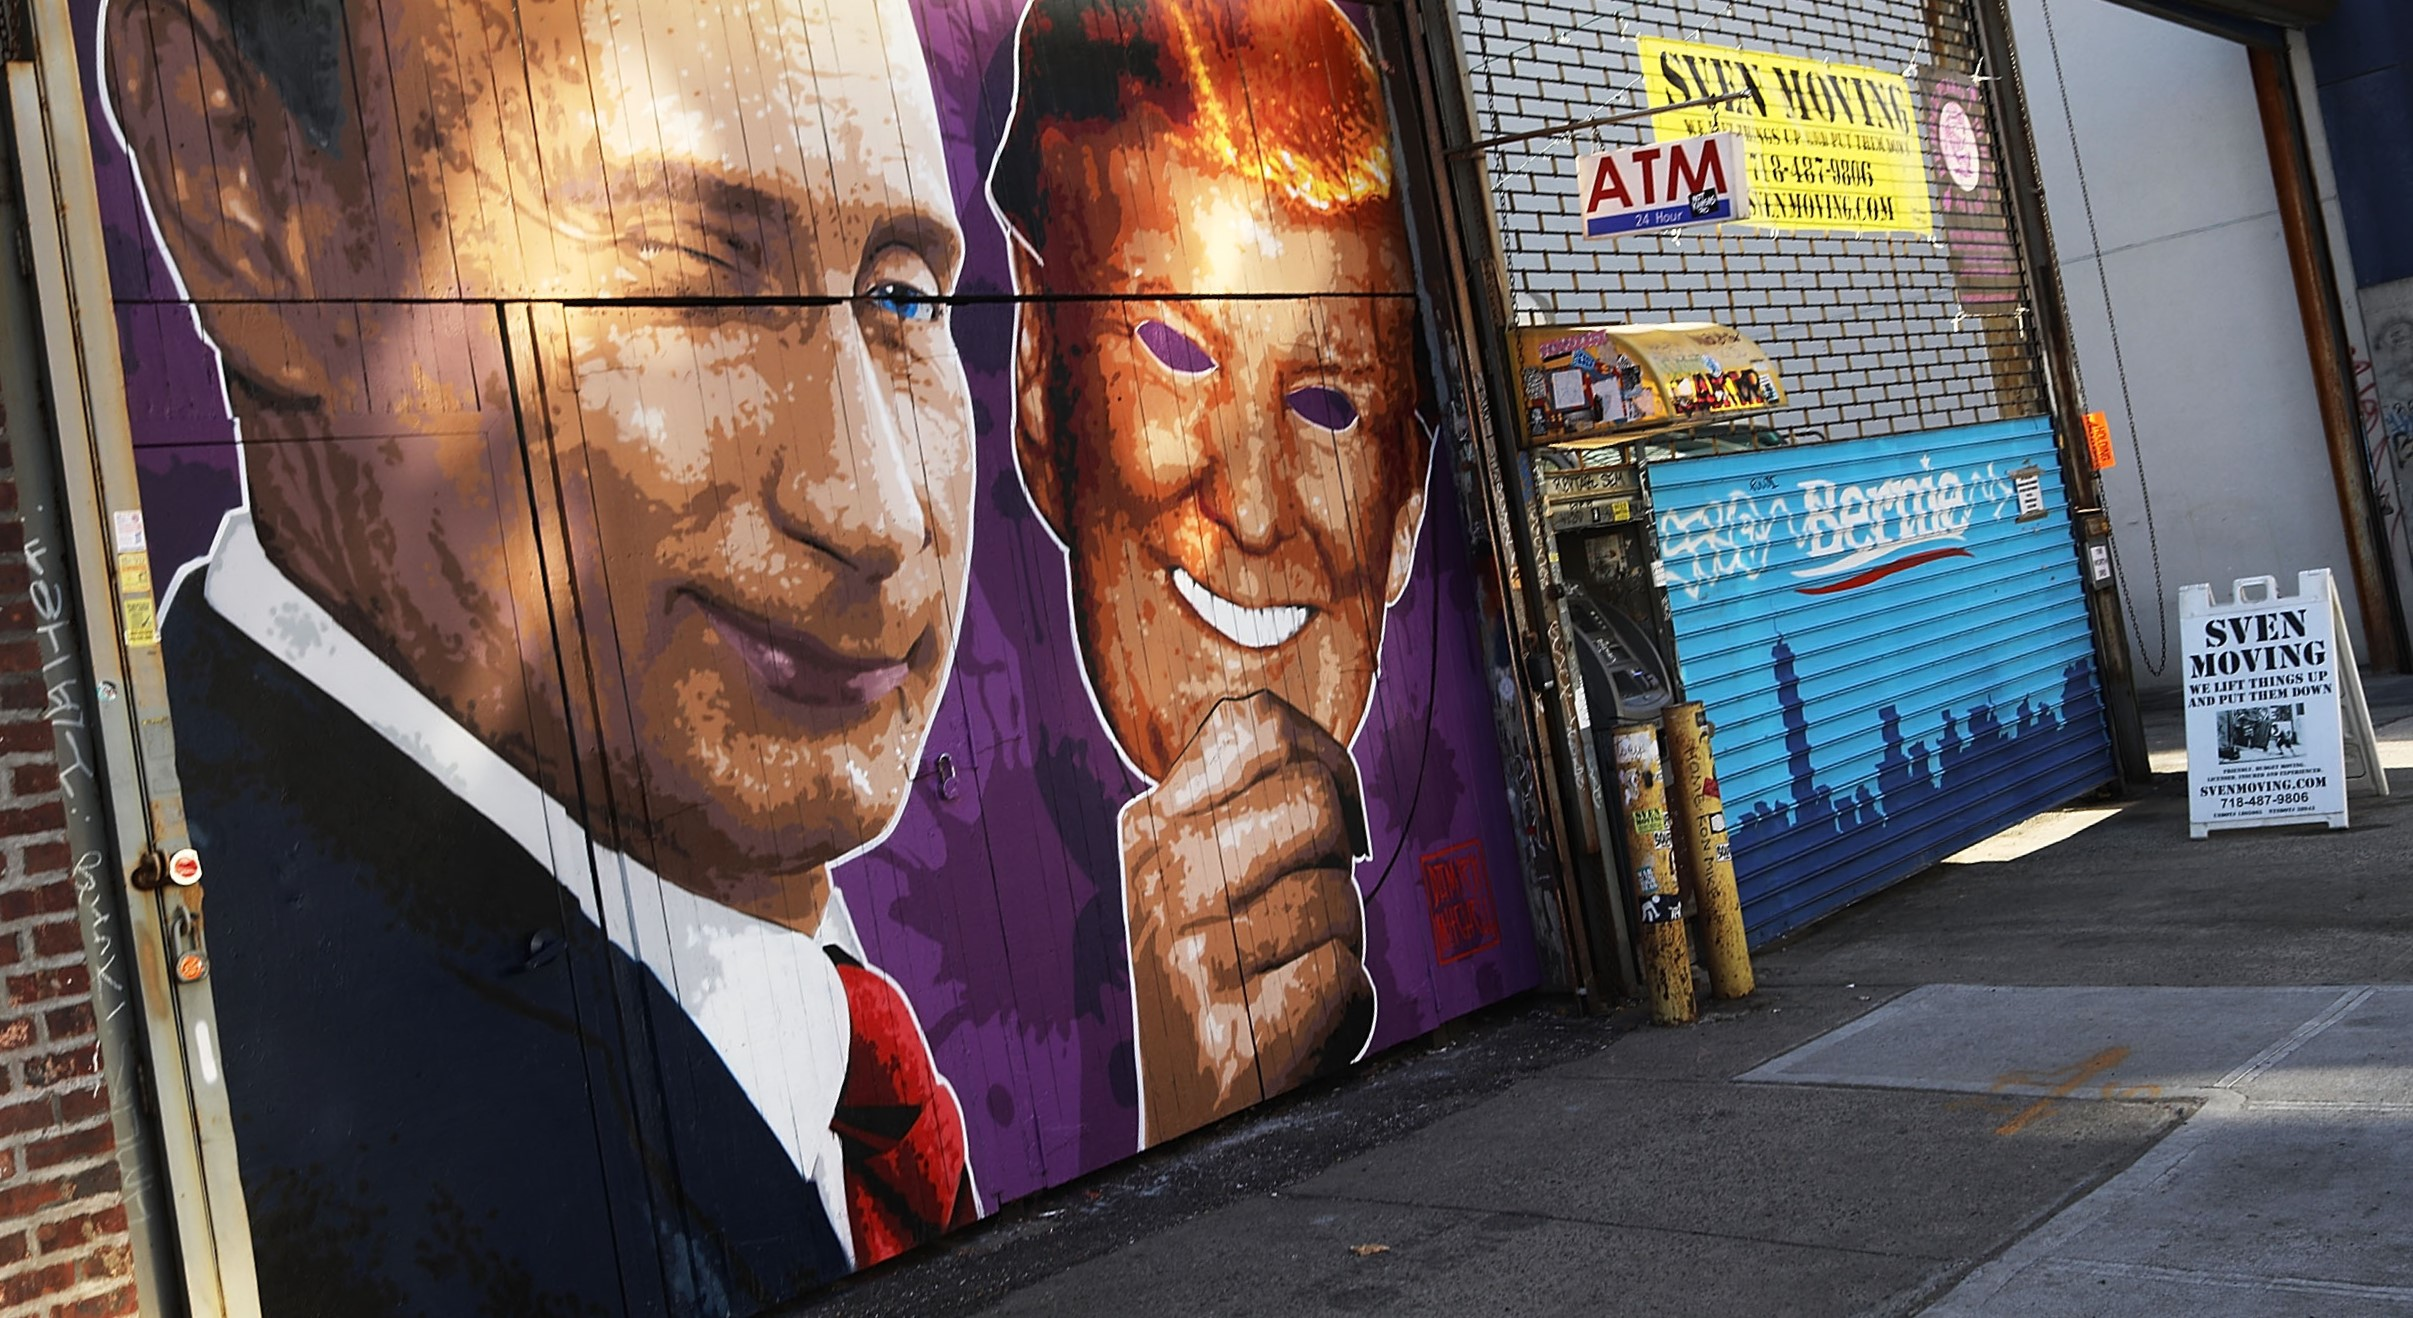 A mural depicting Vladimir Putin taking off a Donald Trump mask, New York, 2017 (Photo: Getty Images/Spencer Platt)